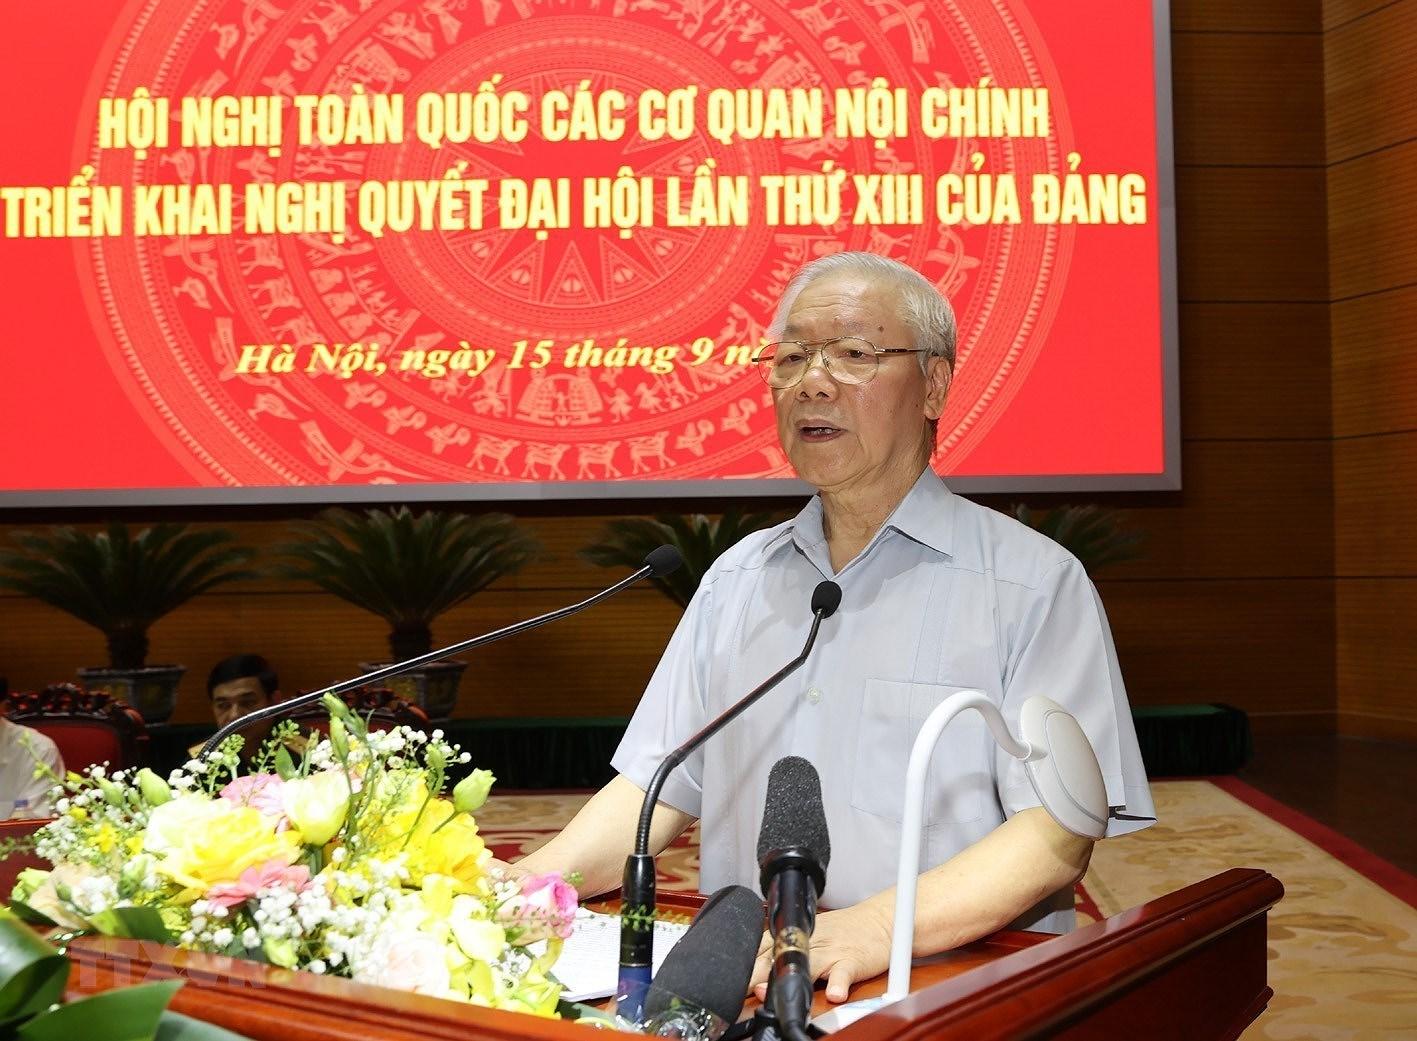 "Cac co quan noi chinh phai that su la nhung ""Thanh bao kiem sac ben"" hinh anh 1"